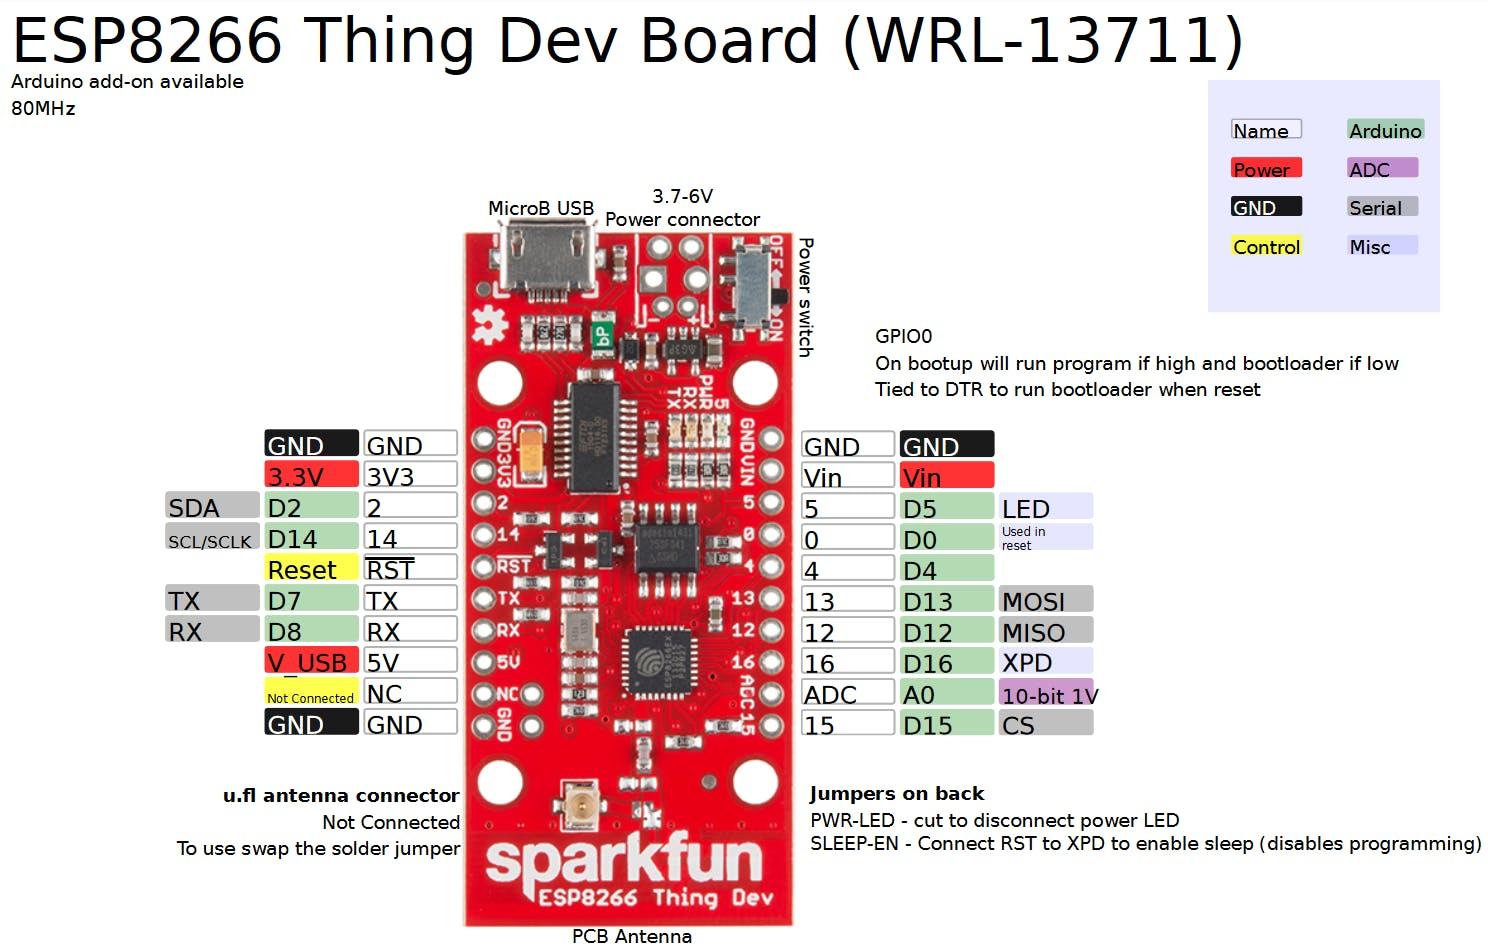 ESP8266 Thing Dev Board Pinout